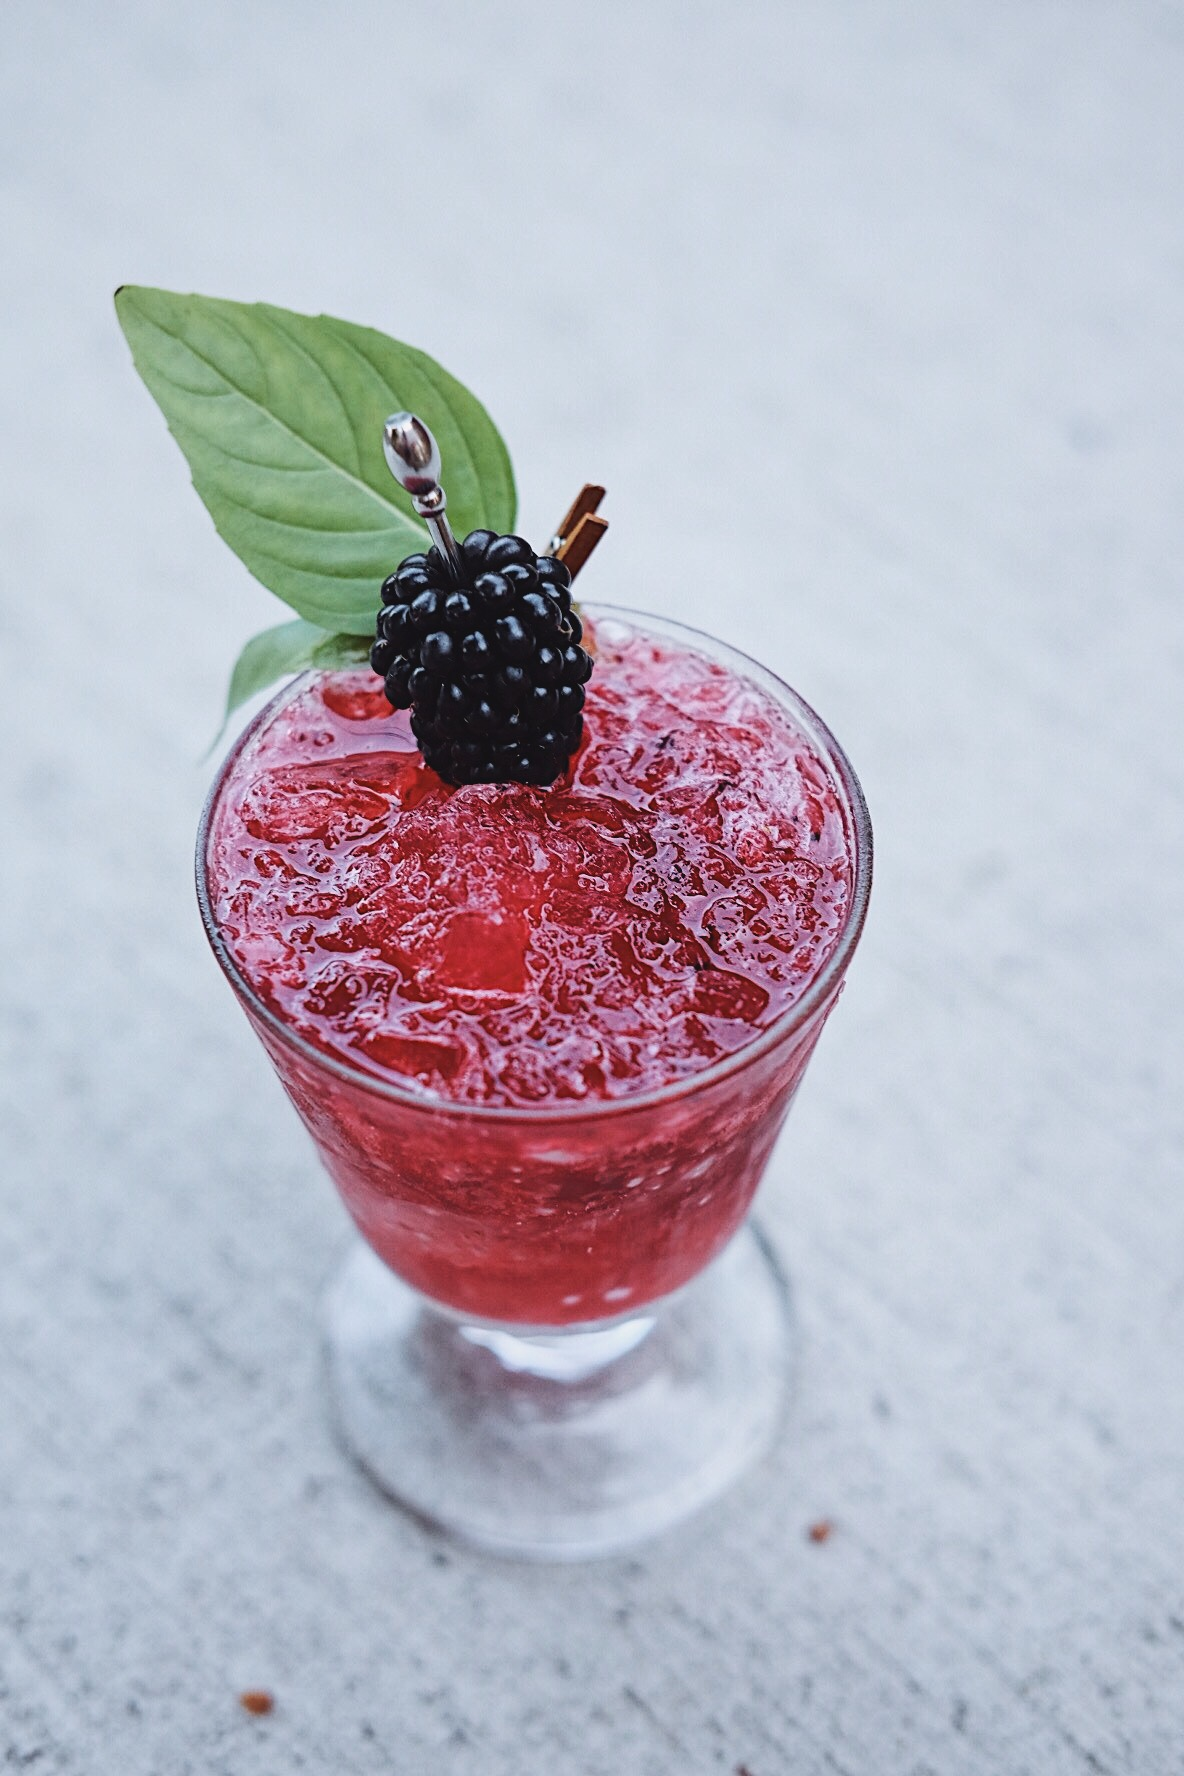 ingredients: - 1 1/2 oz bourbon1/2 oz ginger liqueur1/2 oz fresh lemon juice1/4 oz honey syrup2-3 blackberriesBasil leaves